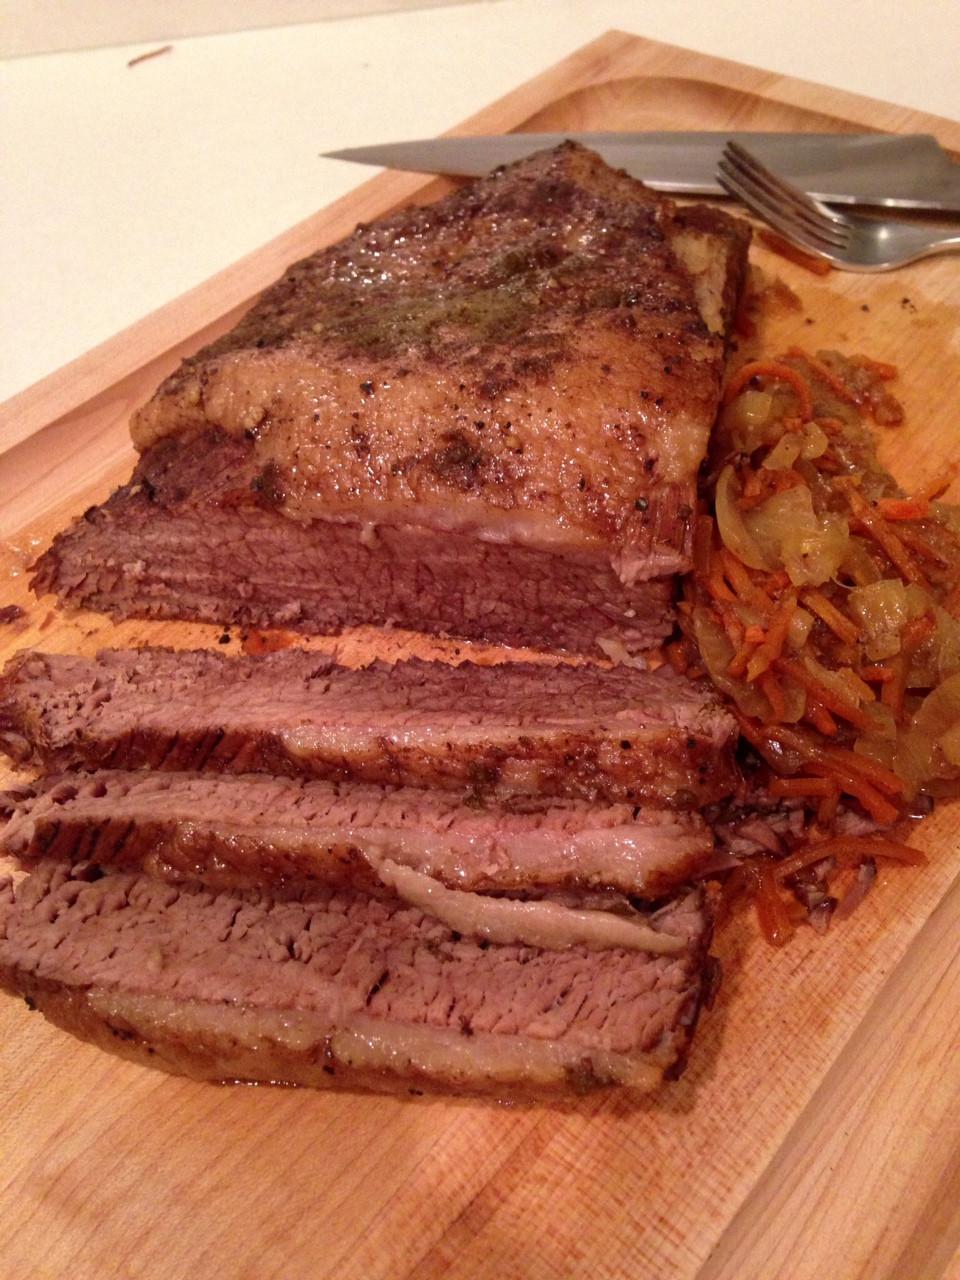 Easy Beef Brisket Slow Cooker Recipe  Slow Cooker Beef Brisket Simple and Straightforward